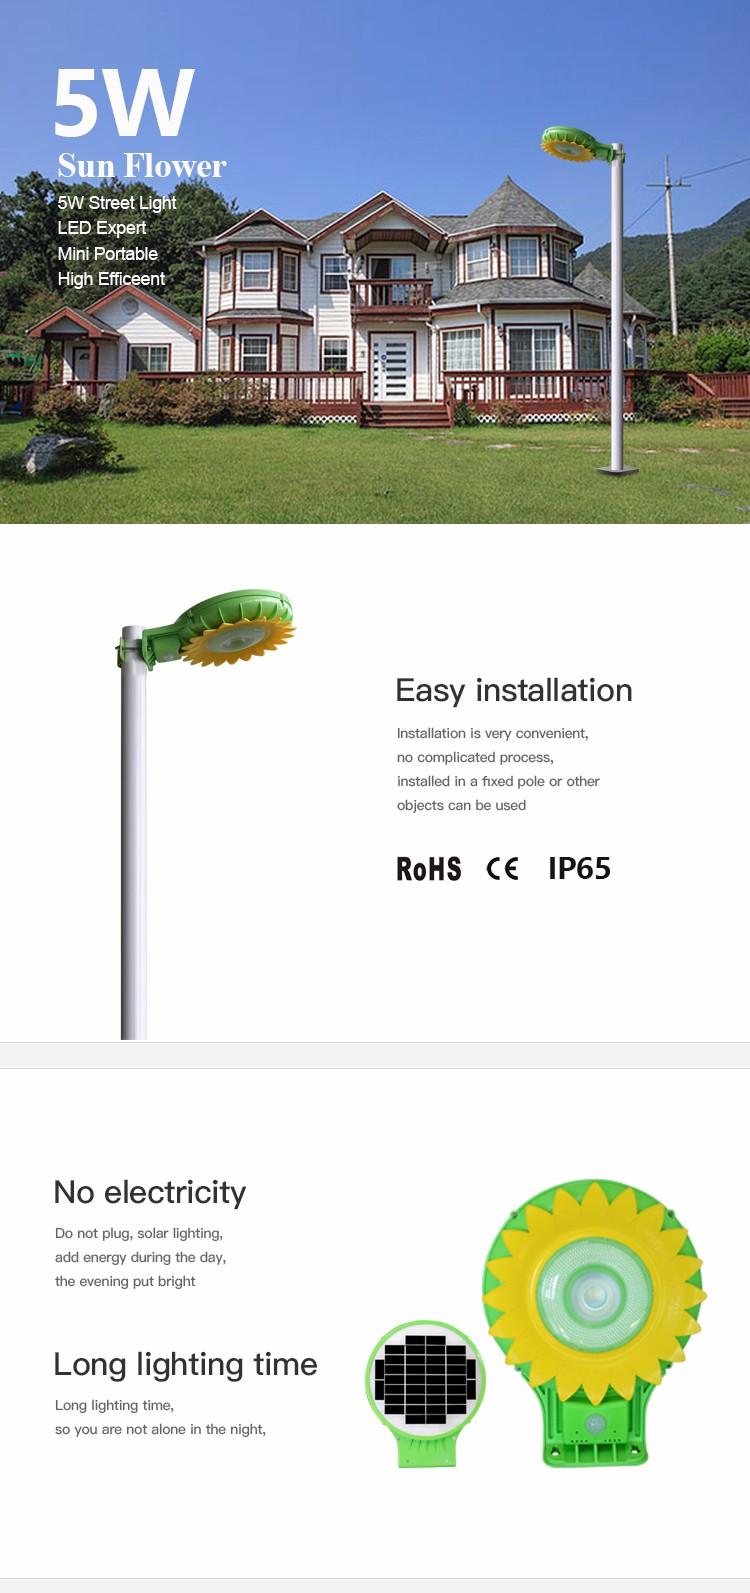 solar led street light 5w (5)